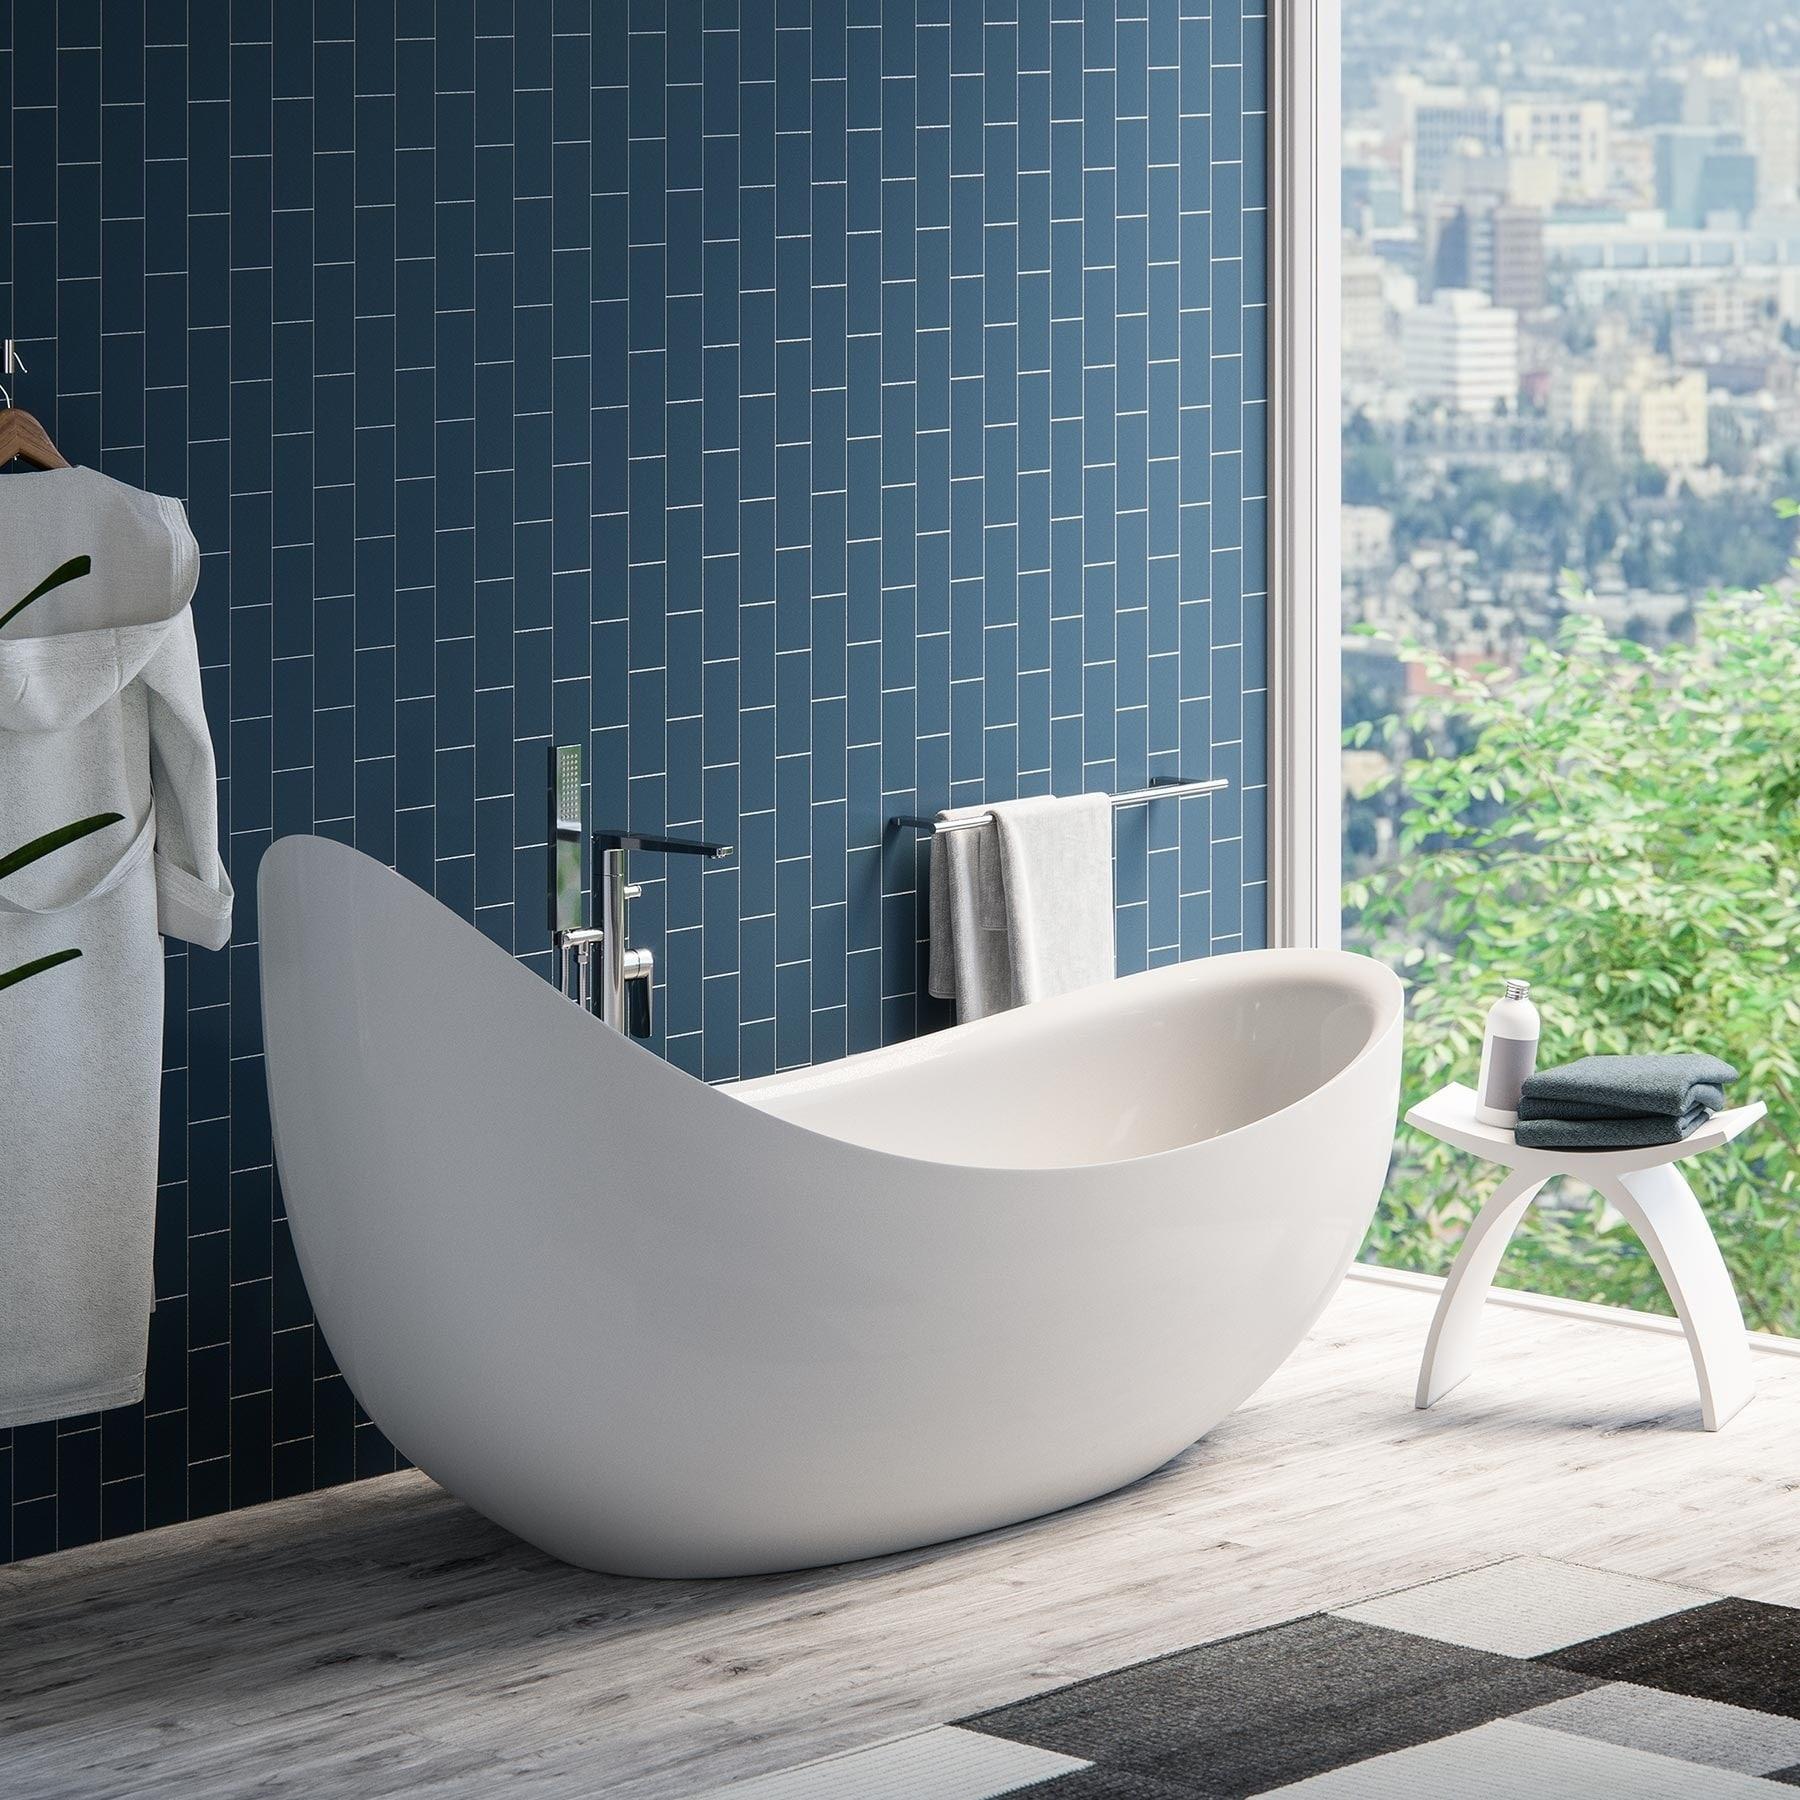 Maykke 79-inch Hialeah White Freestanding Bathtub (79 Inc...